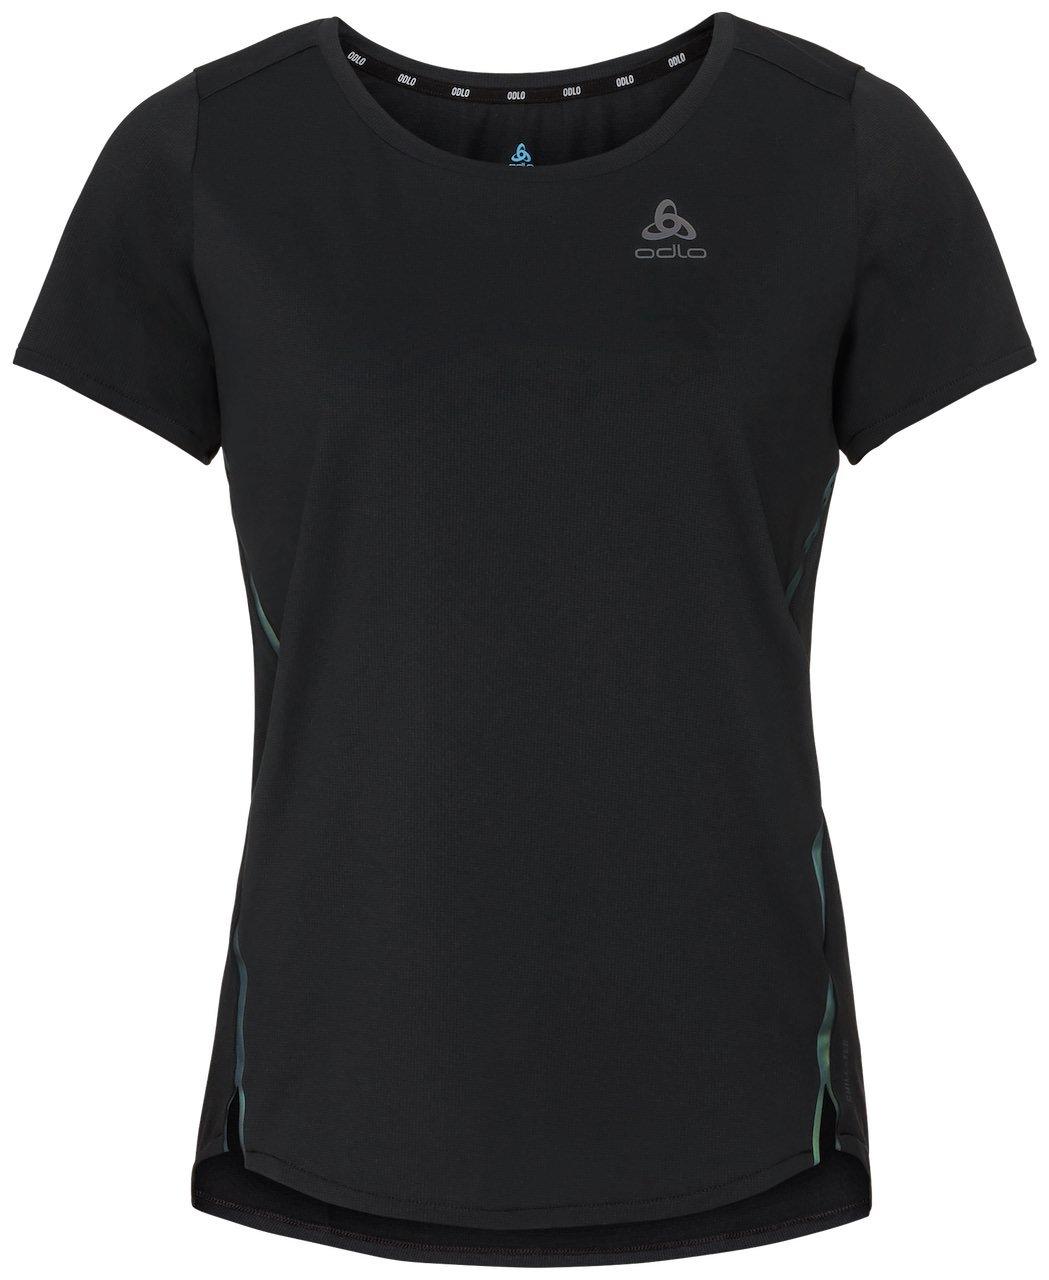 Chill-Tec Black T-Shirt S S Ws_313621_60257_A